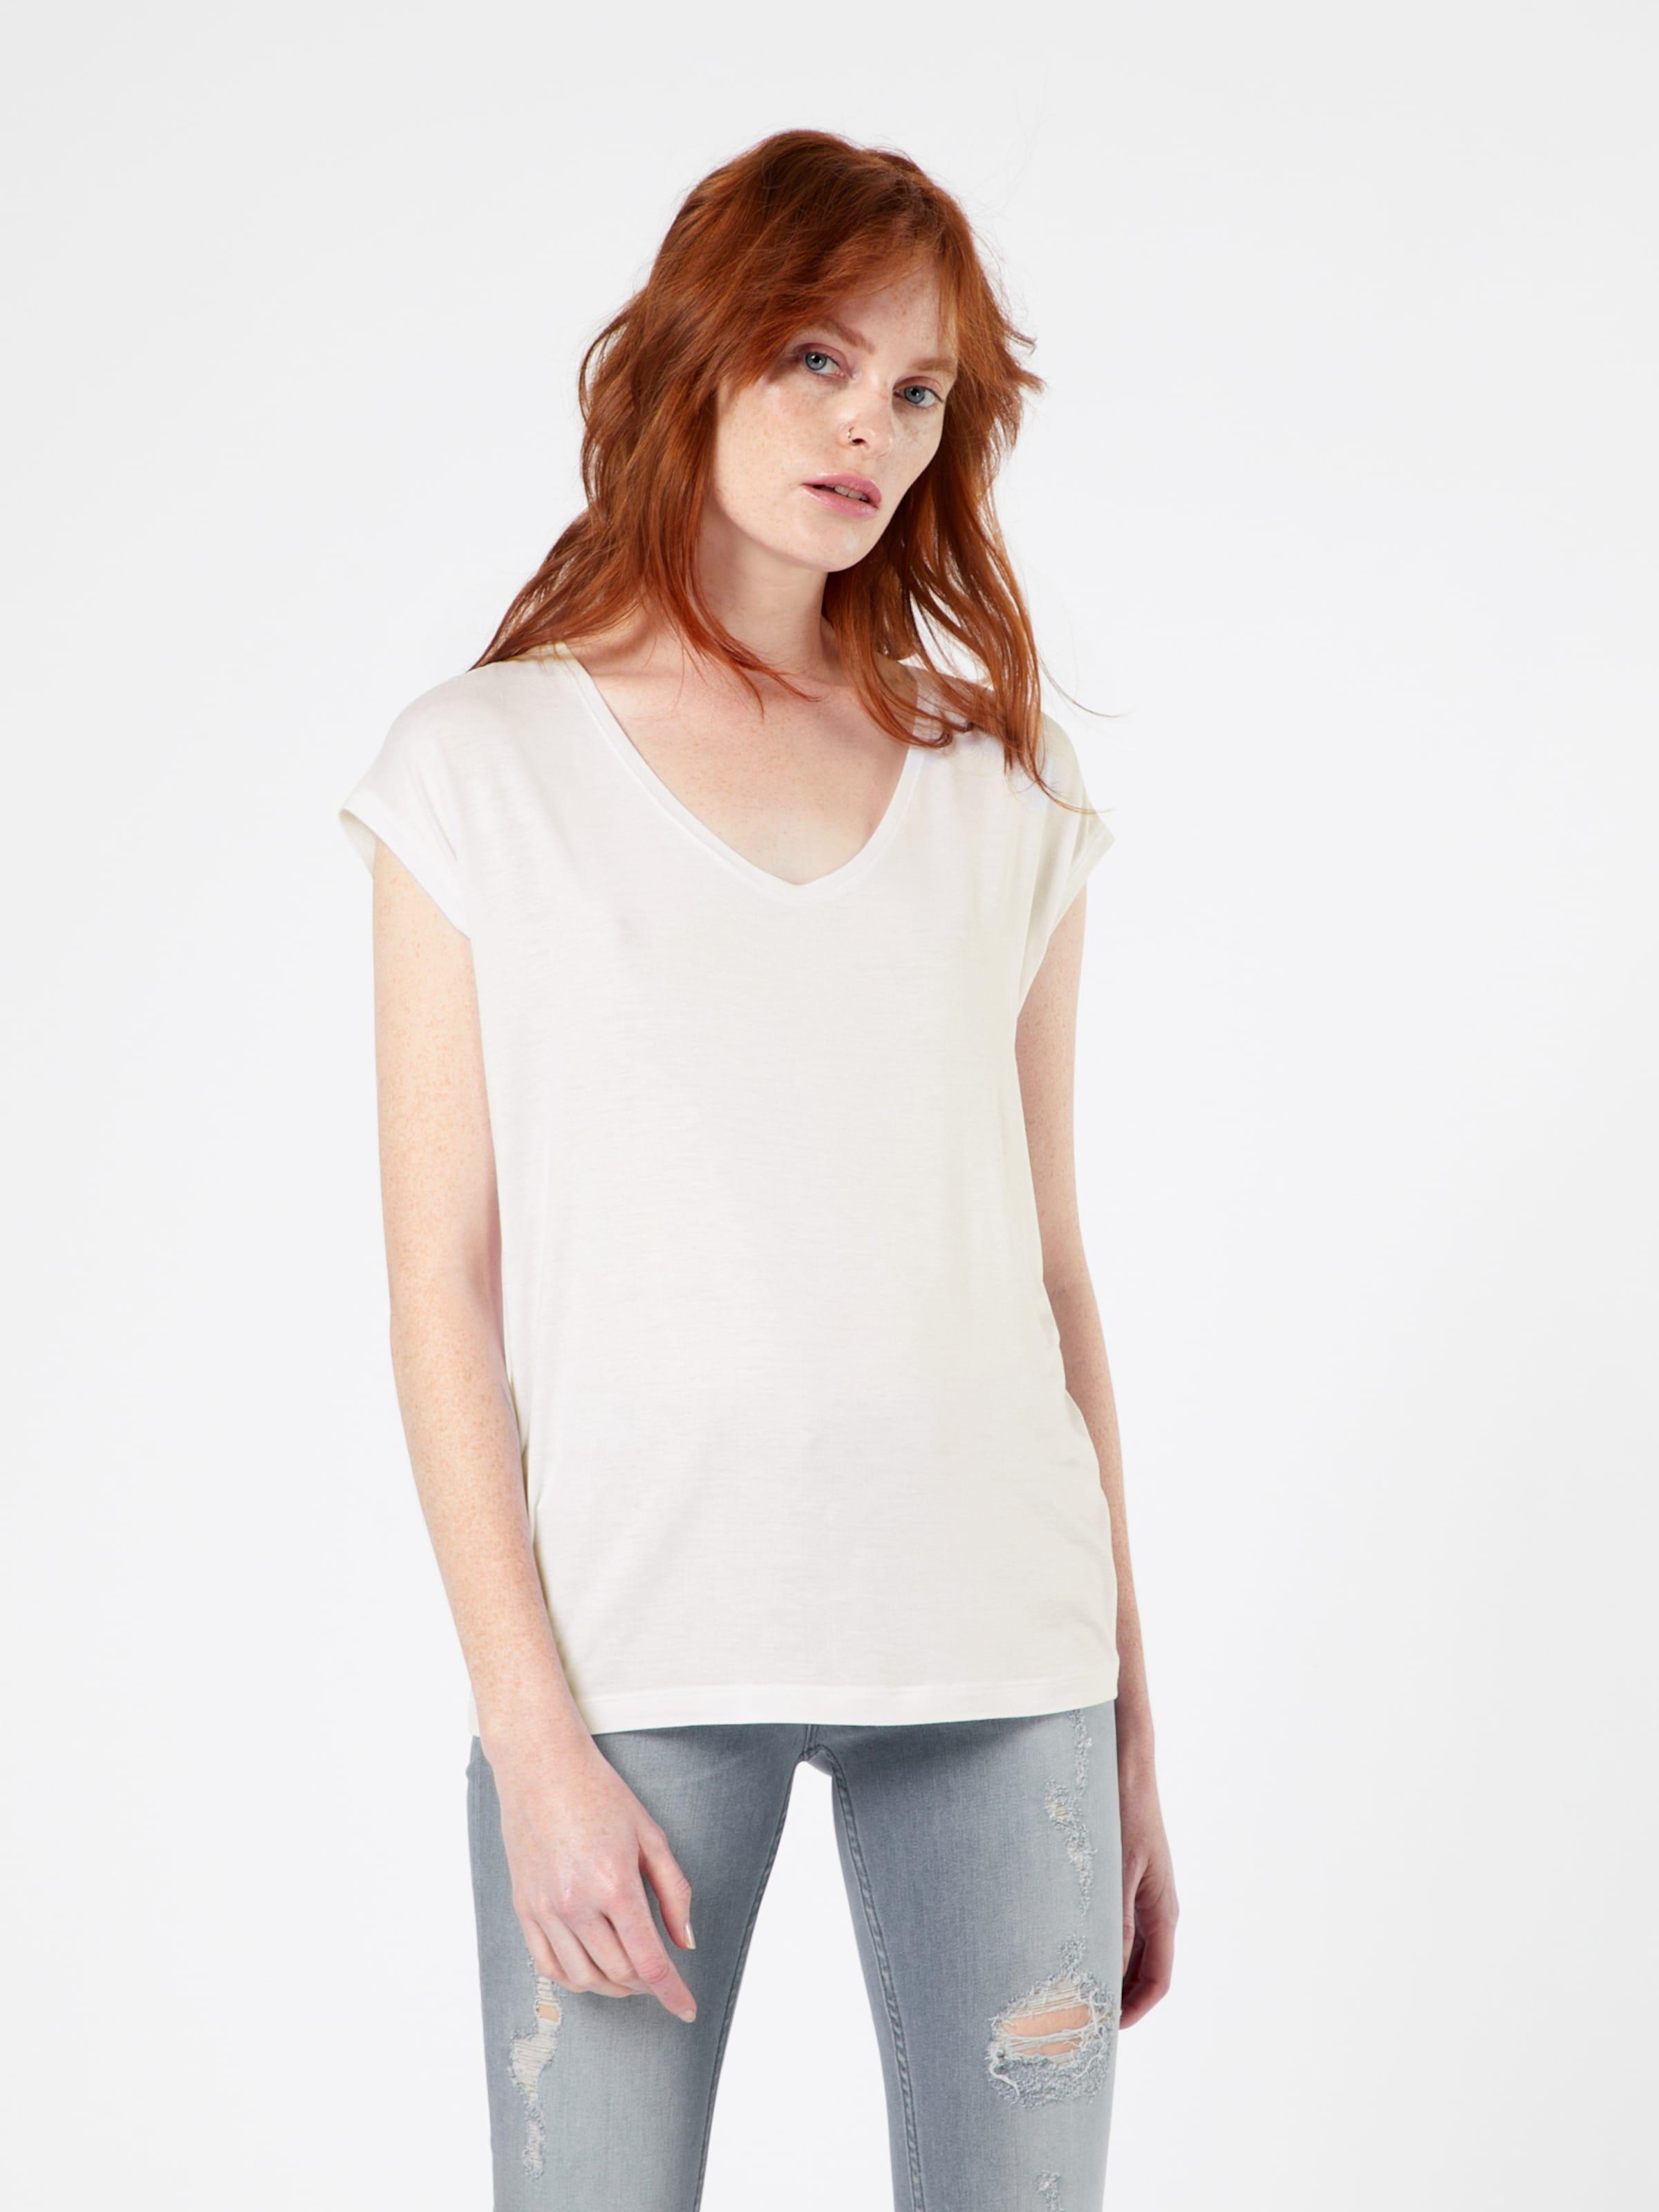 Pieces shirt T En Blanc 'billo' qUMpSzGV